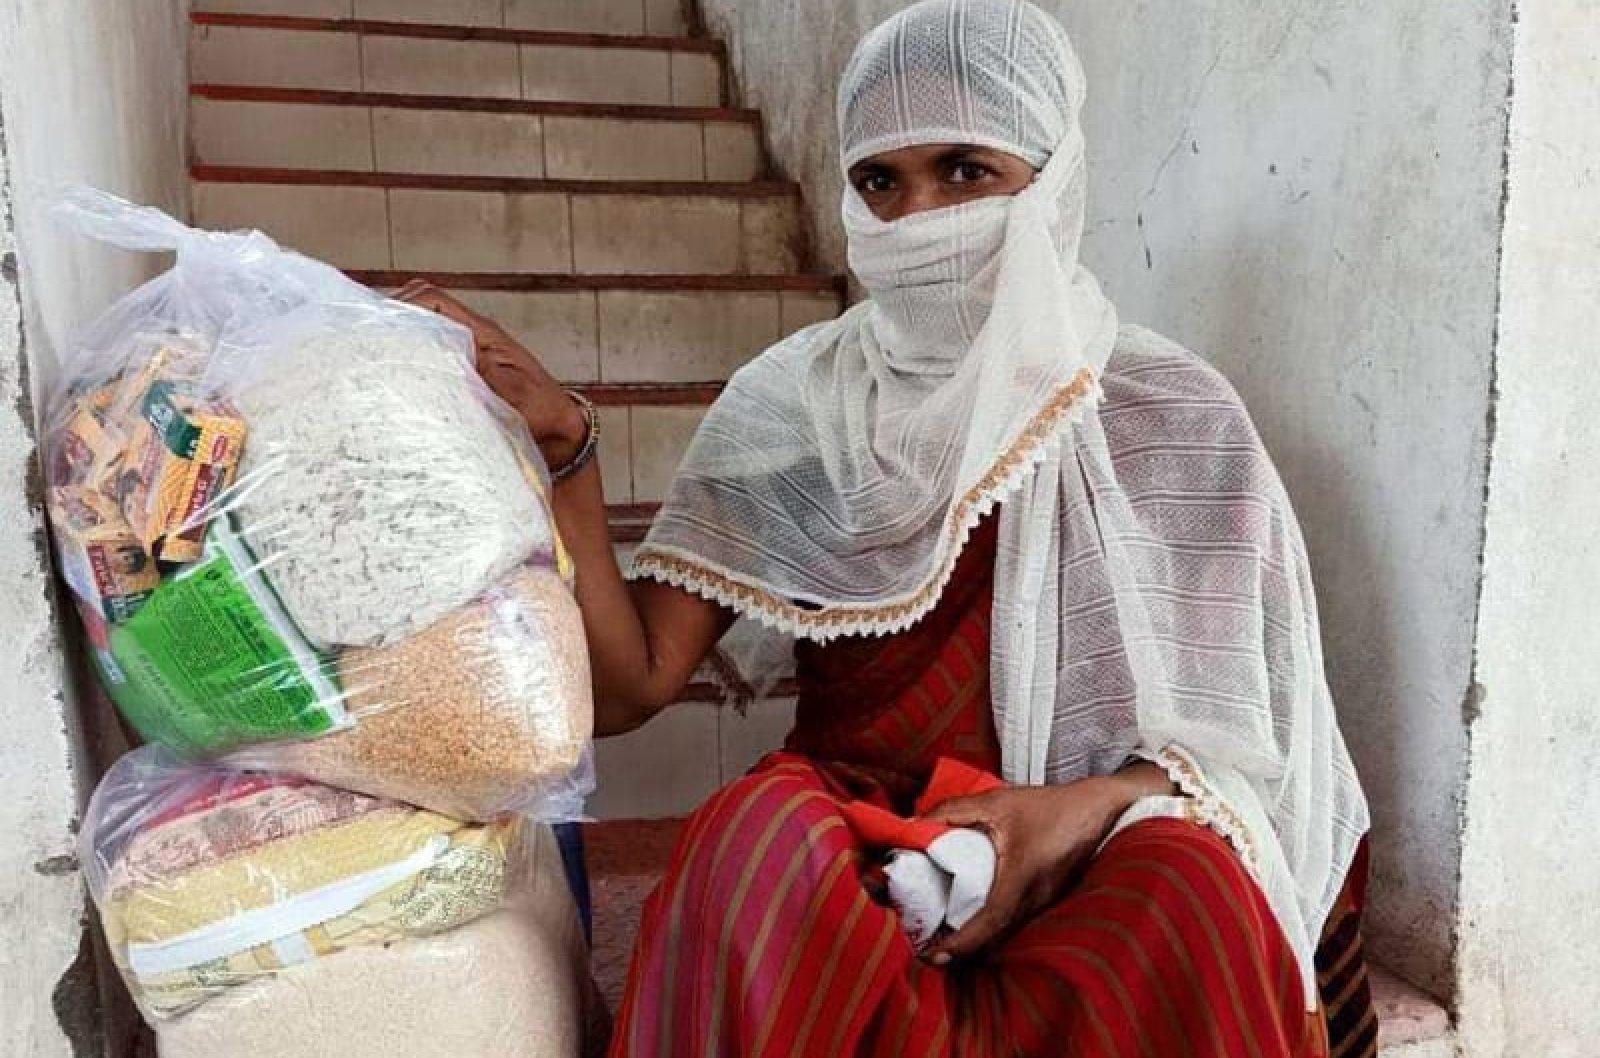 India blames religious minorities for coronavirus contagion